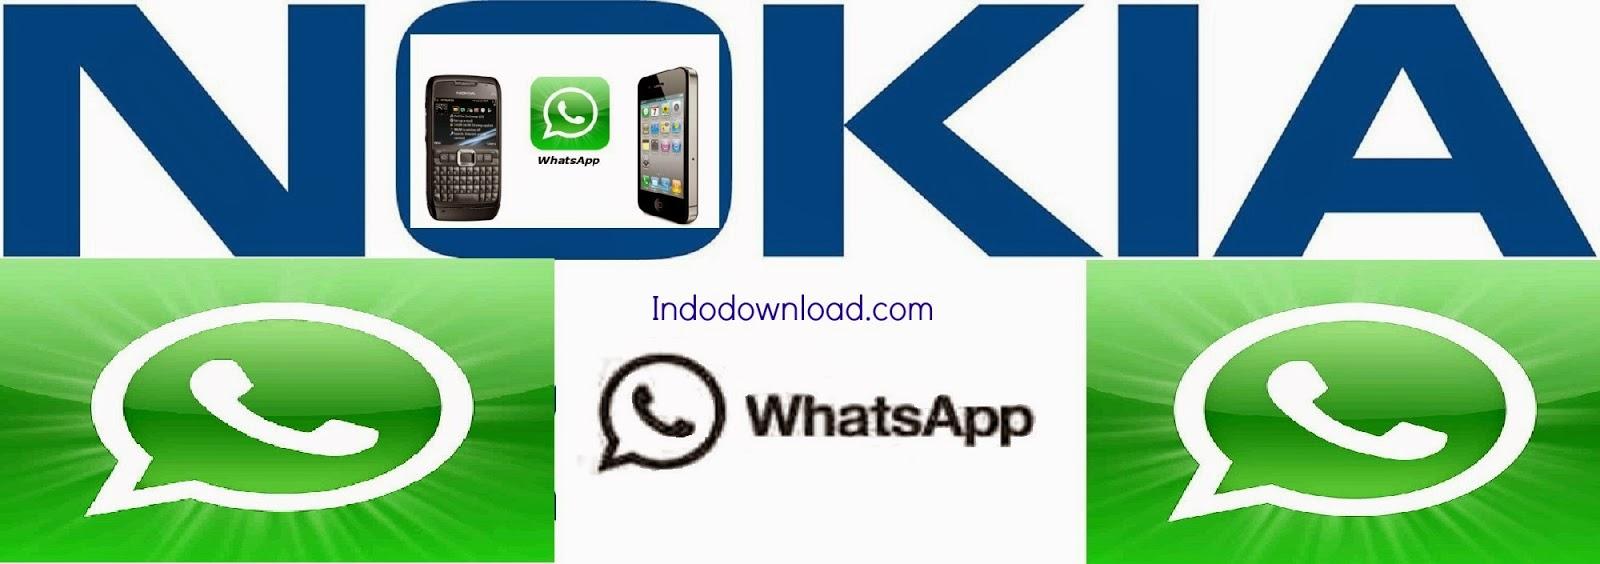 watsapp for nokia 5233 | tcj corcoranpartners com